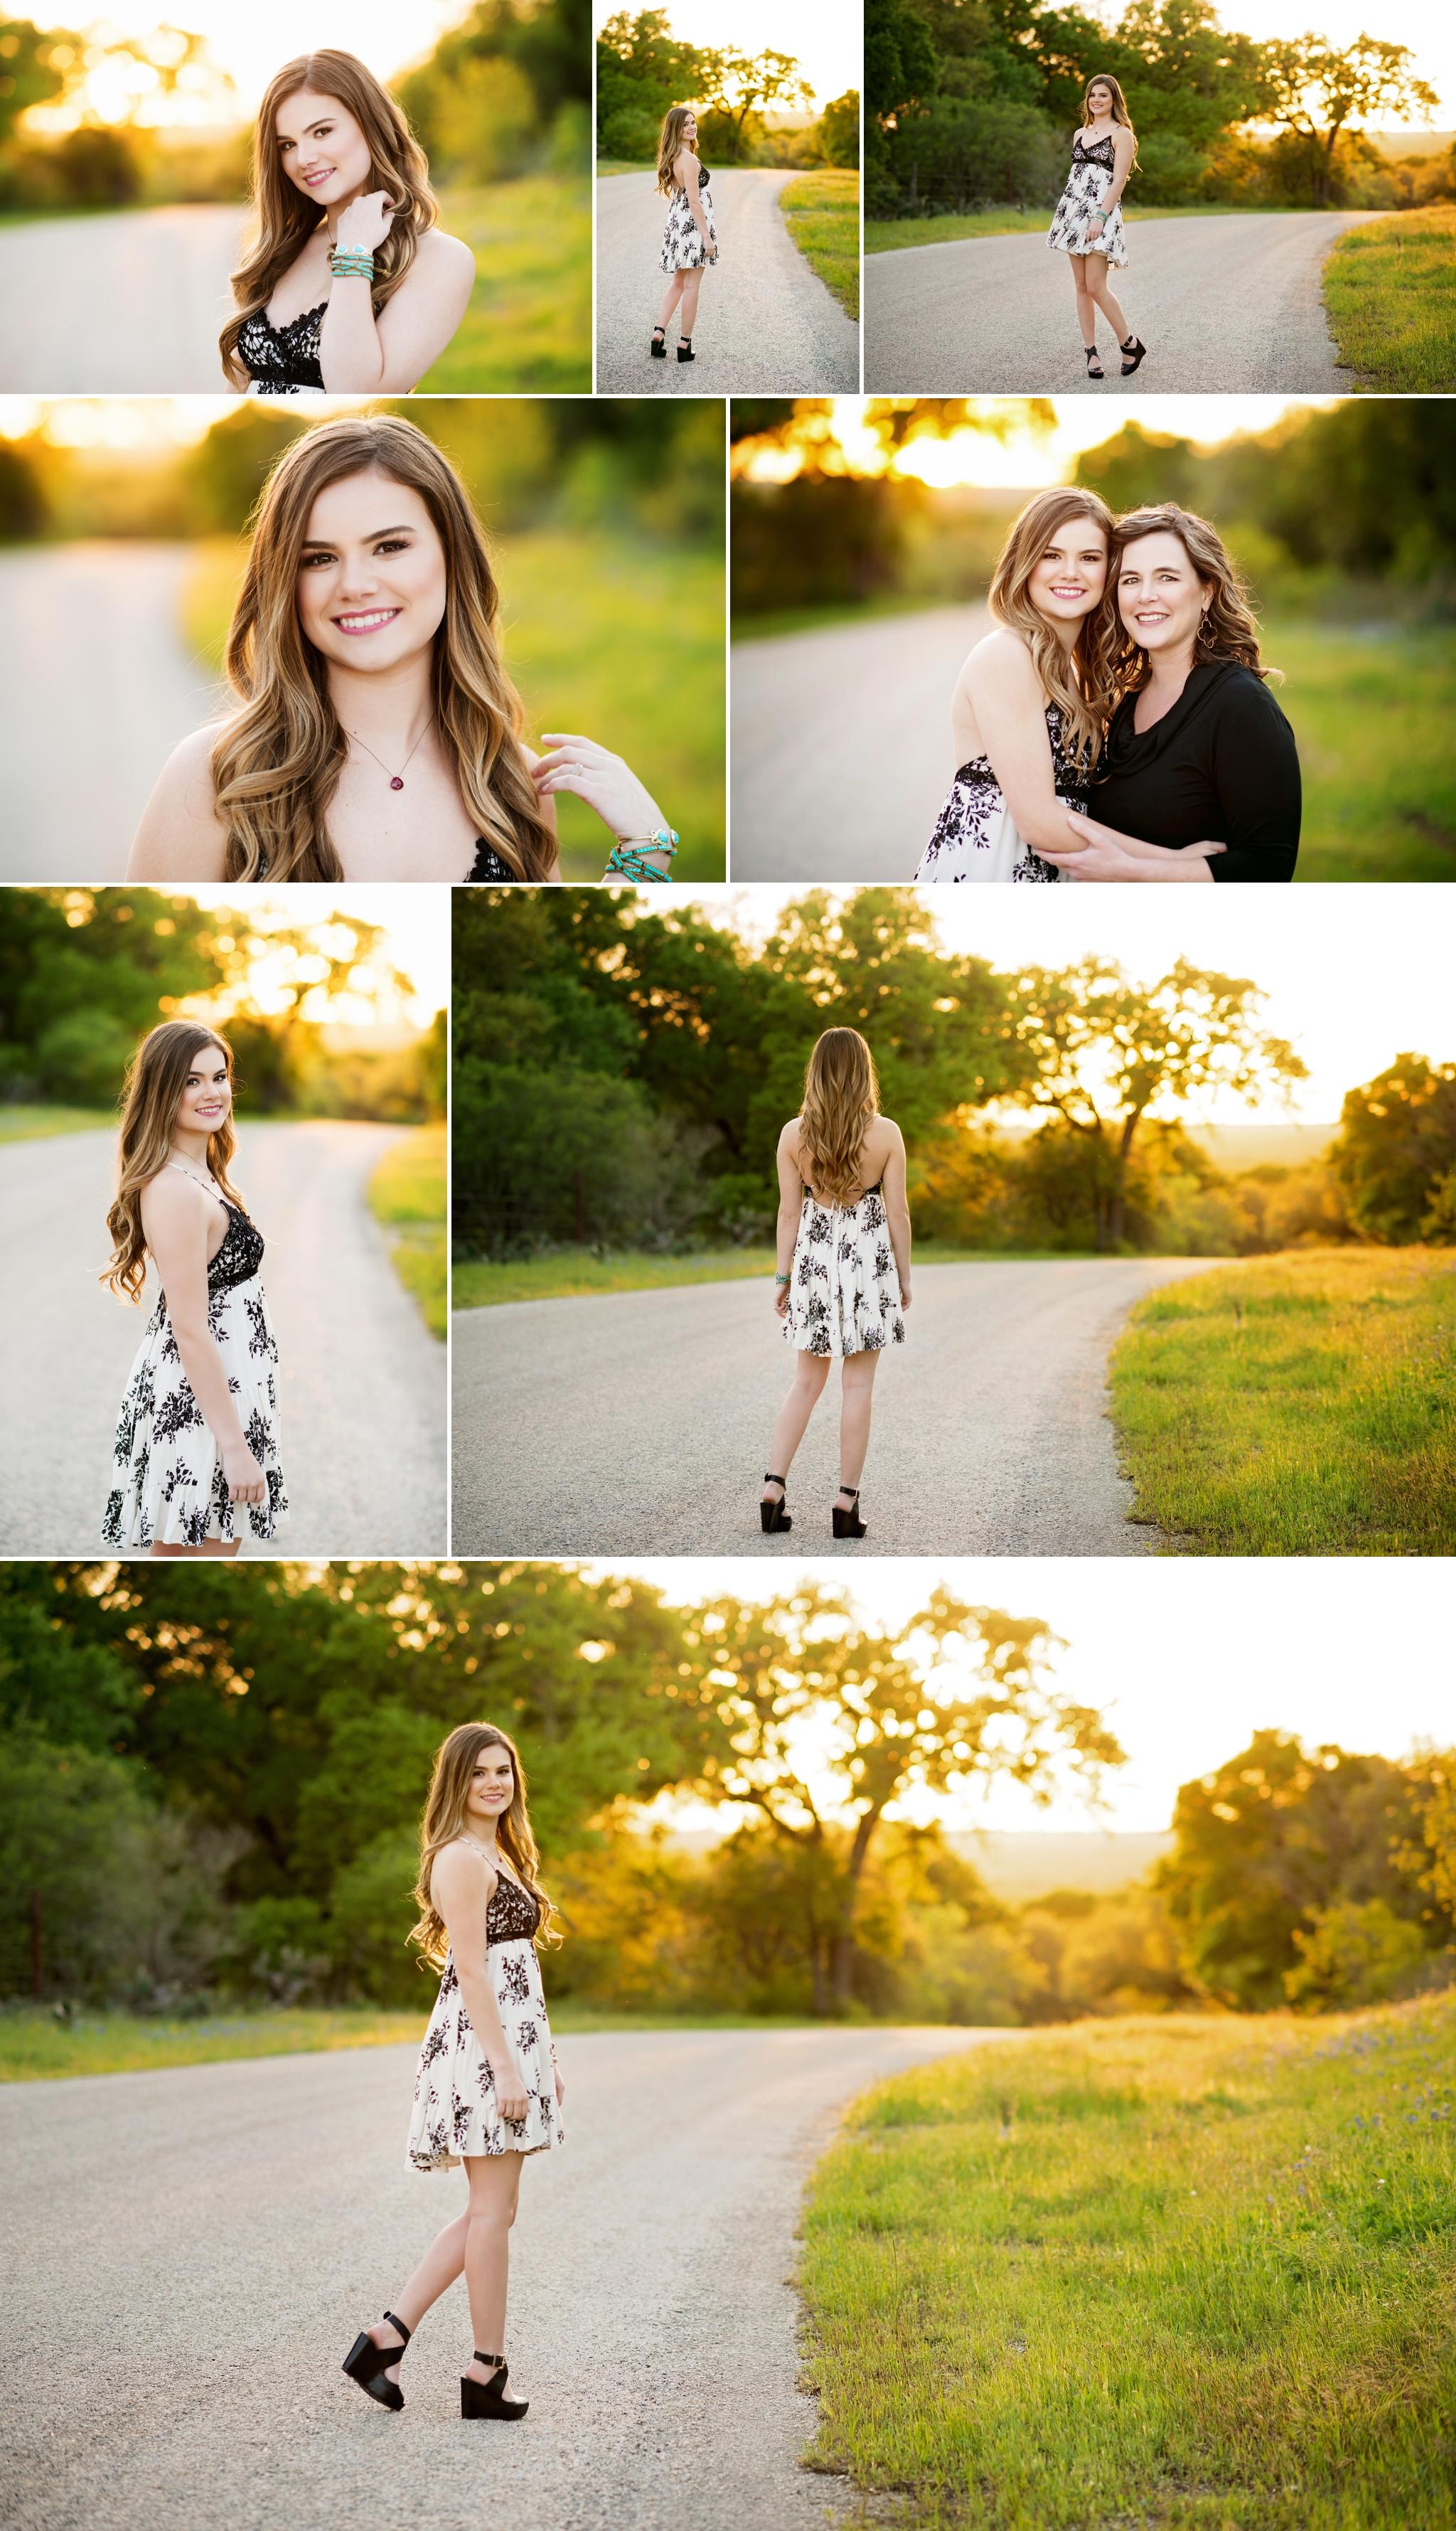 Austin Senior Portrait photography ideas by Heidi Knight Photography